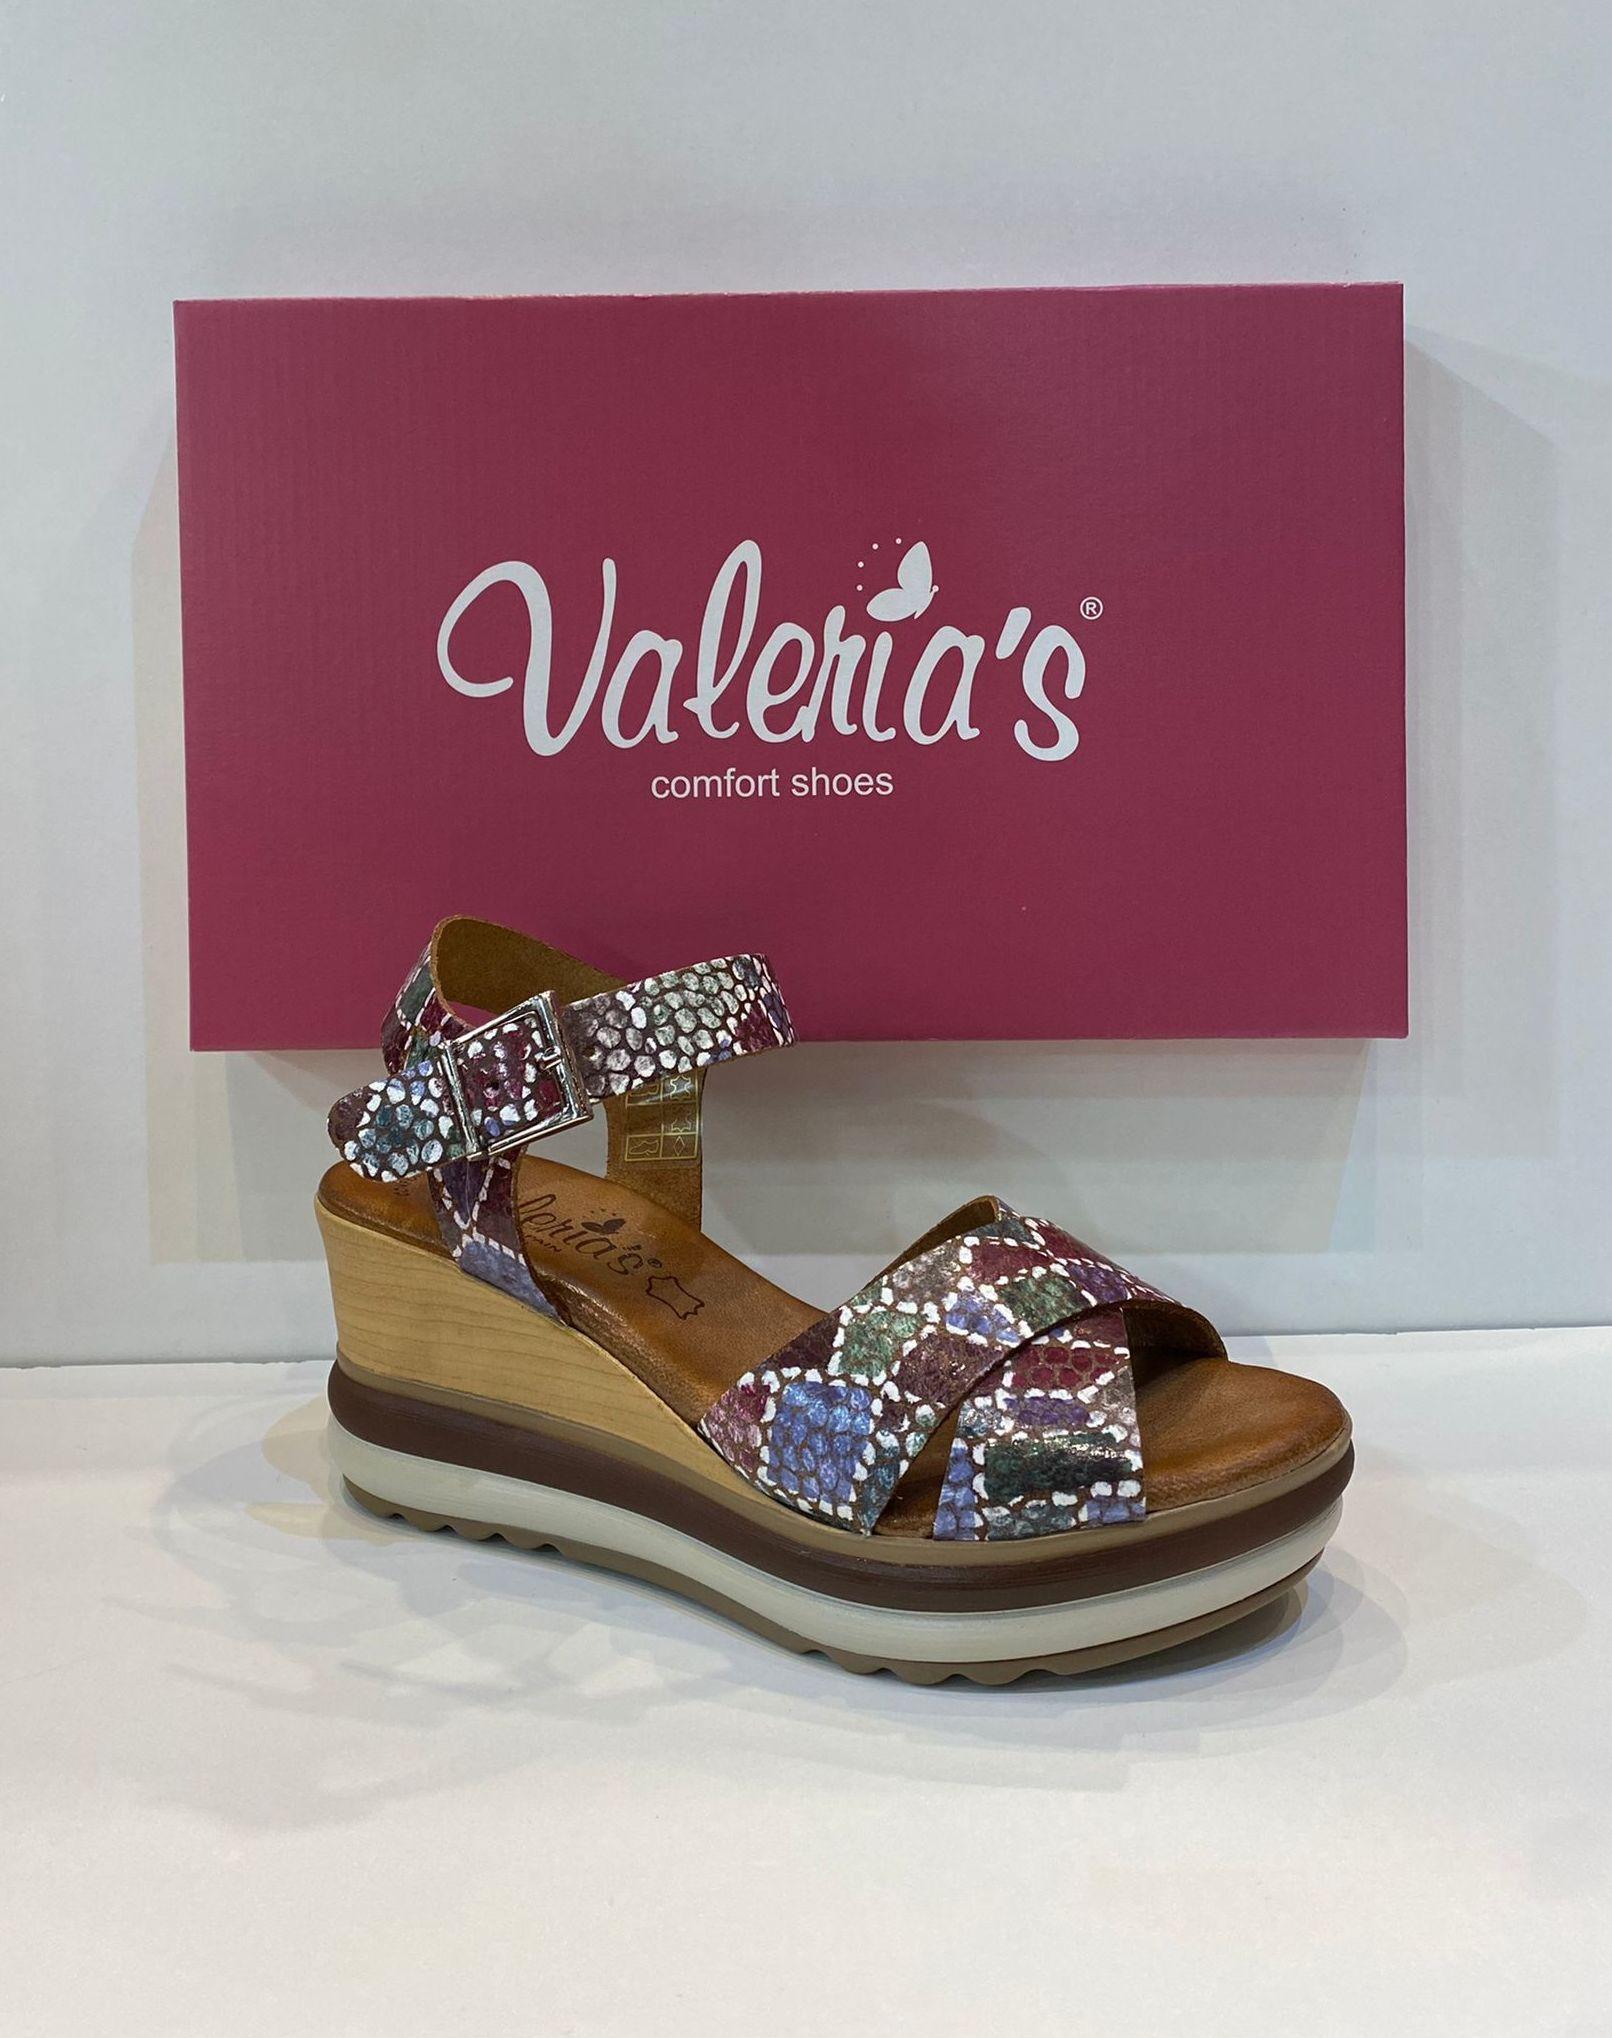 Sandàlia de dona, de la marca Valeria's, plantilla de gel de viscoelàstica, sola de politilè 49.90€ www.calzadosllinas.es